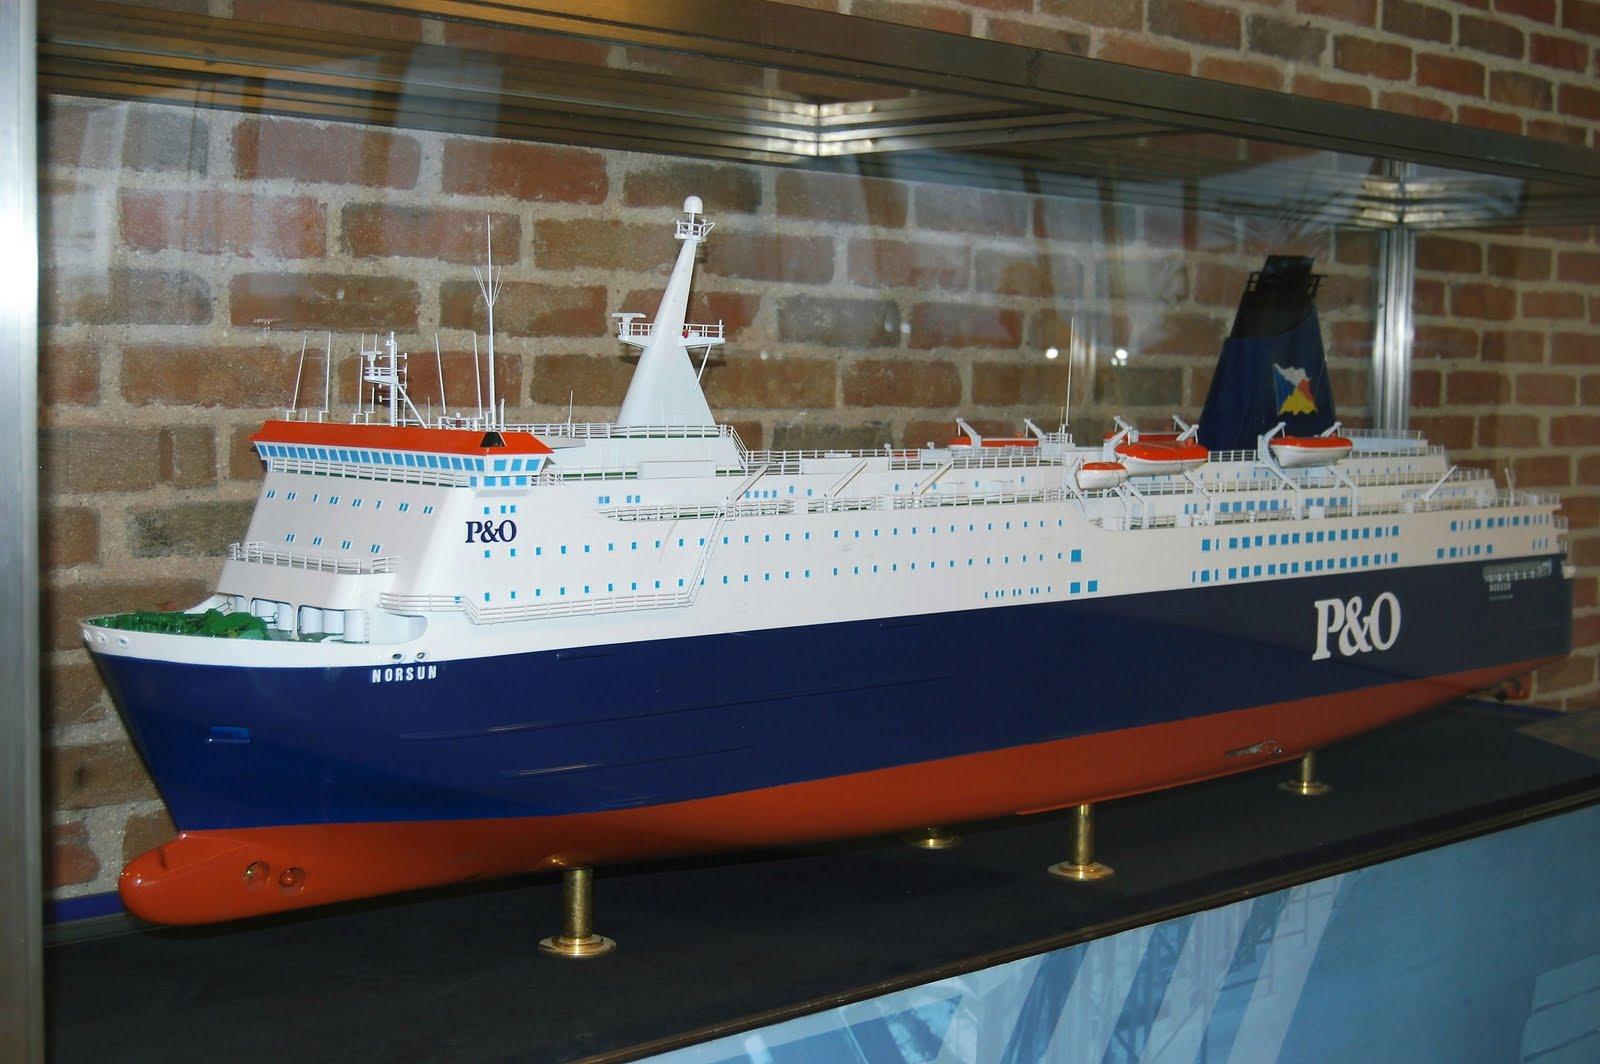 Vmf the ferry terminal at zeebrugge - Where is zeebrugge ferry port ...